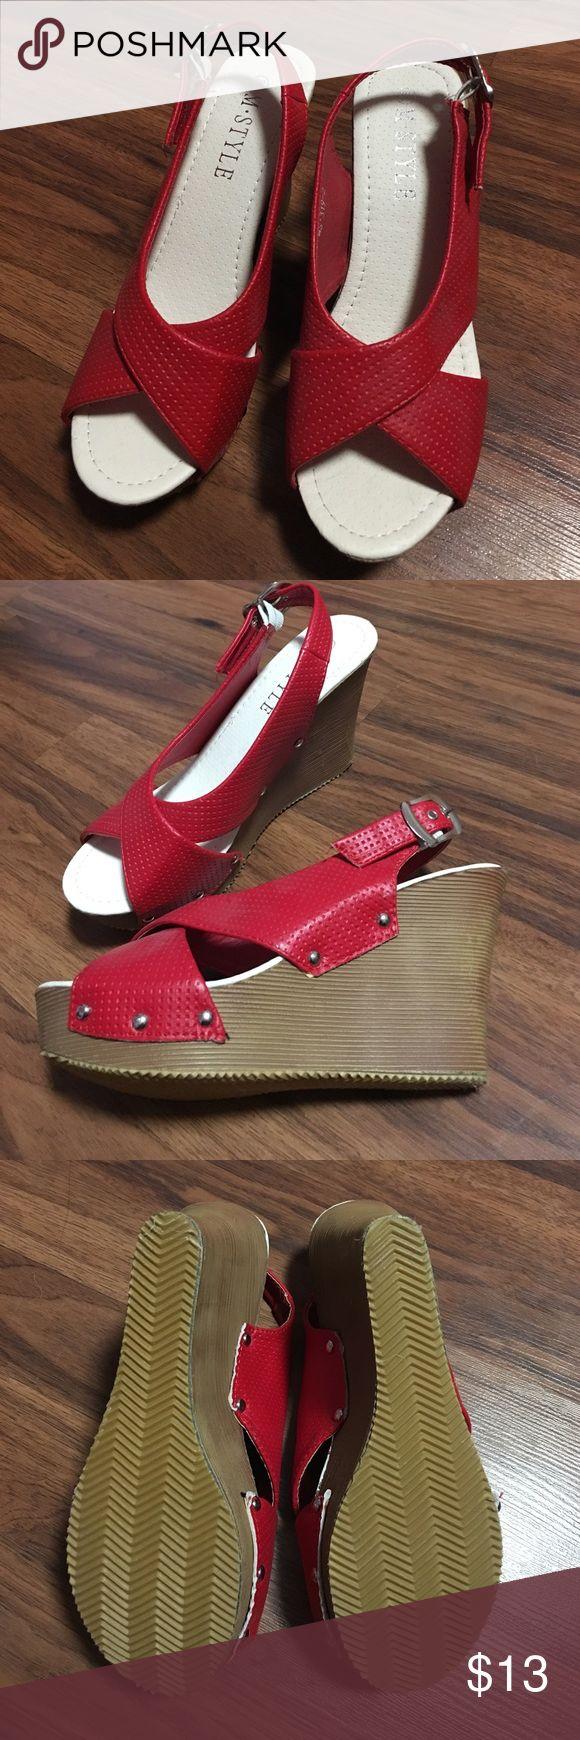 Red platform wedges NWOT Red leather straps, adjustable, brown wedges, never used size 7 Shoes Wedges